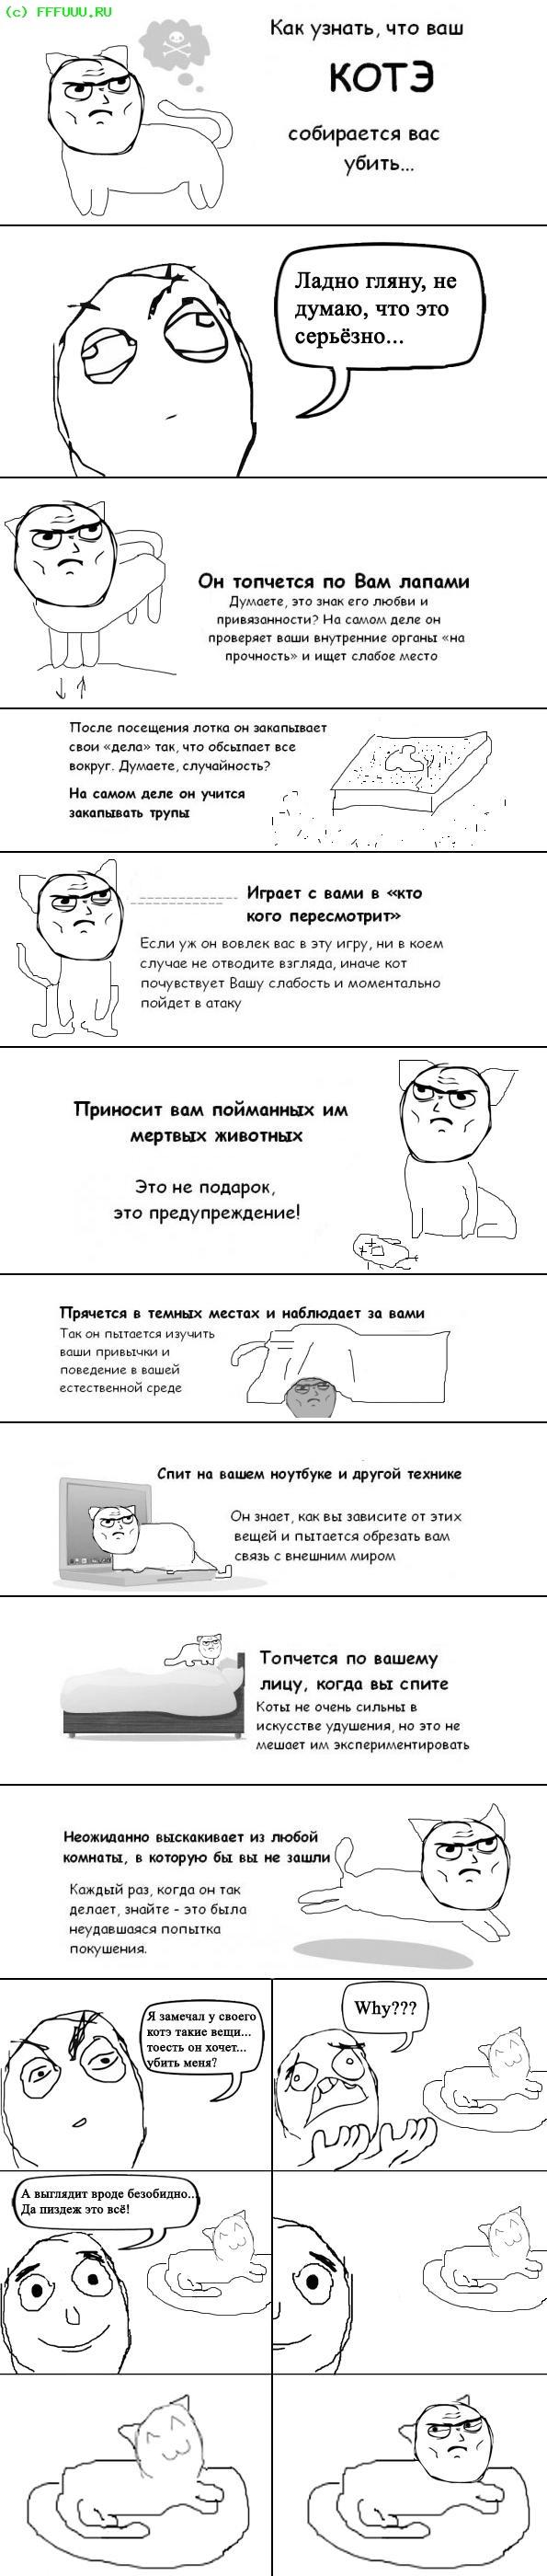 http://i.playground.ru/i/05/34/84/00/pix/image.jpg